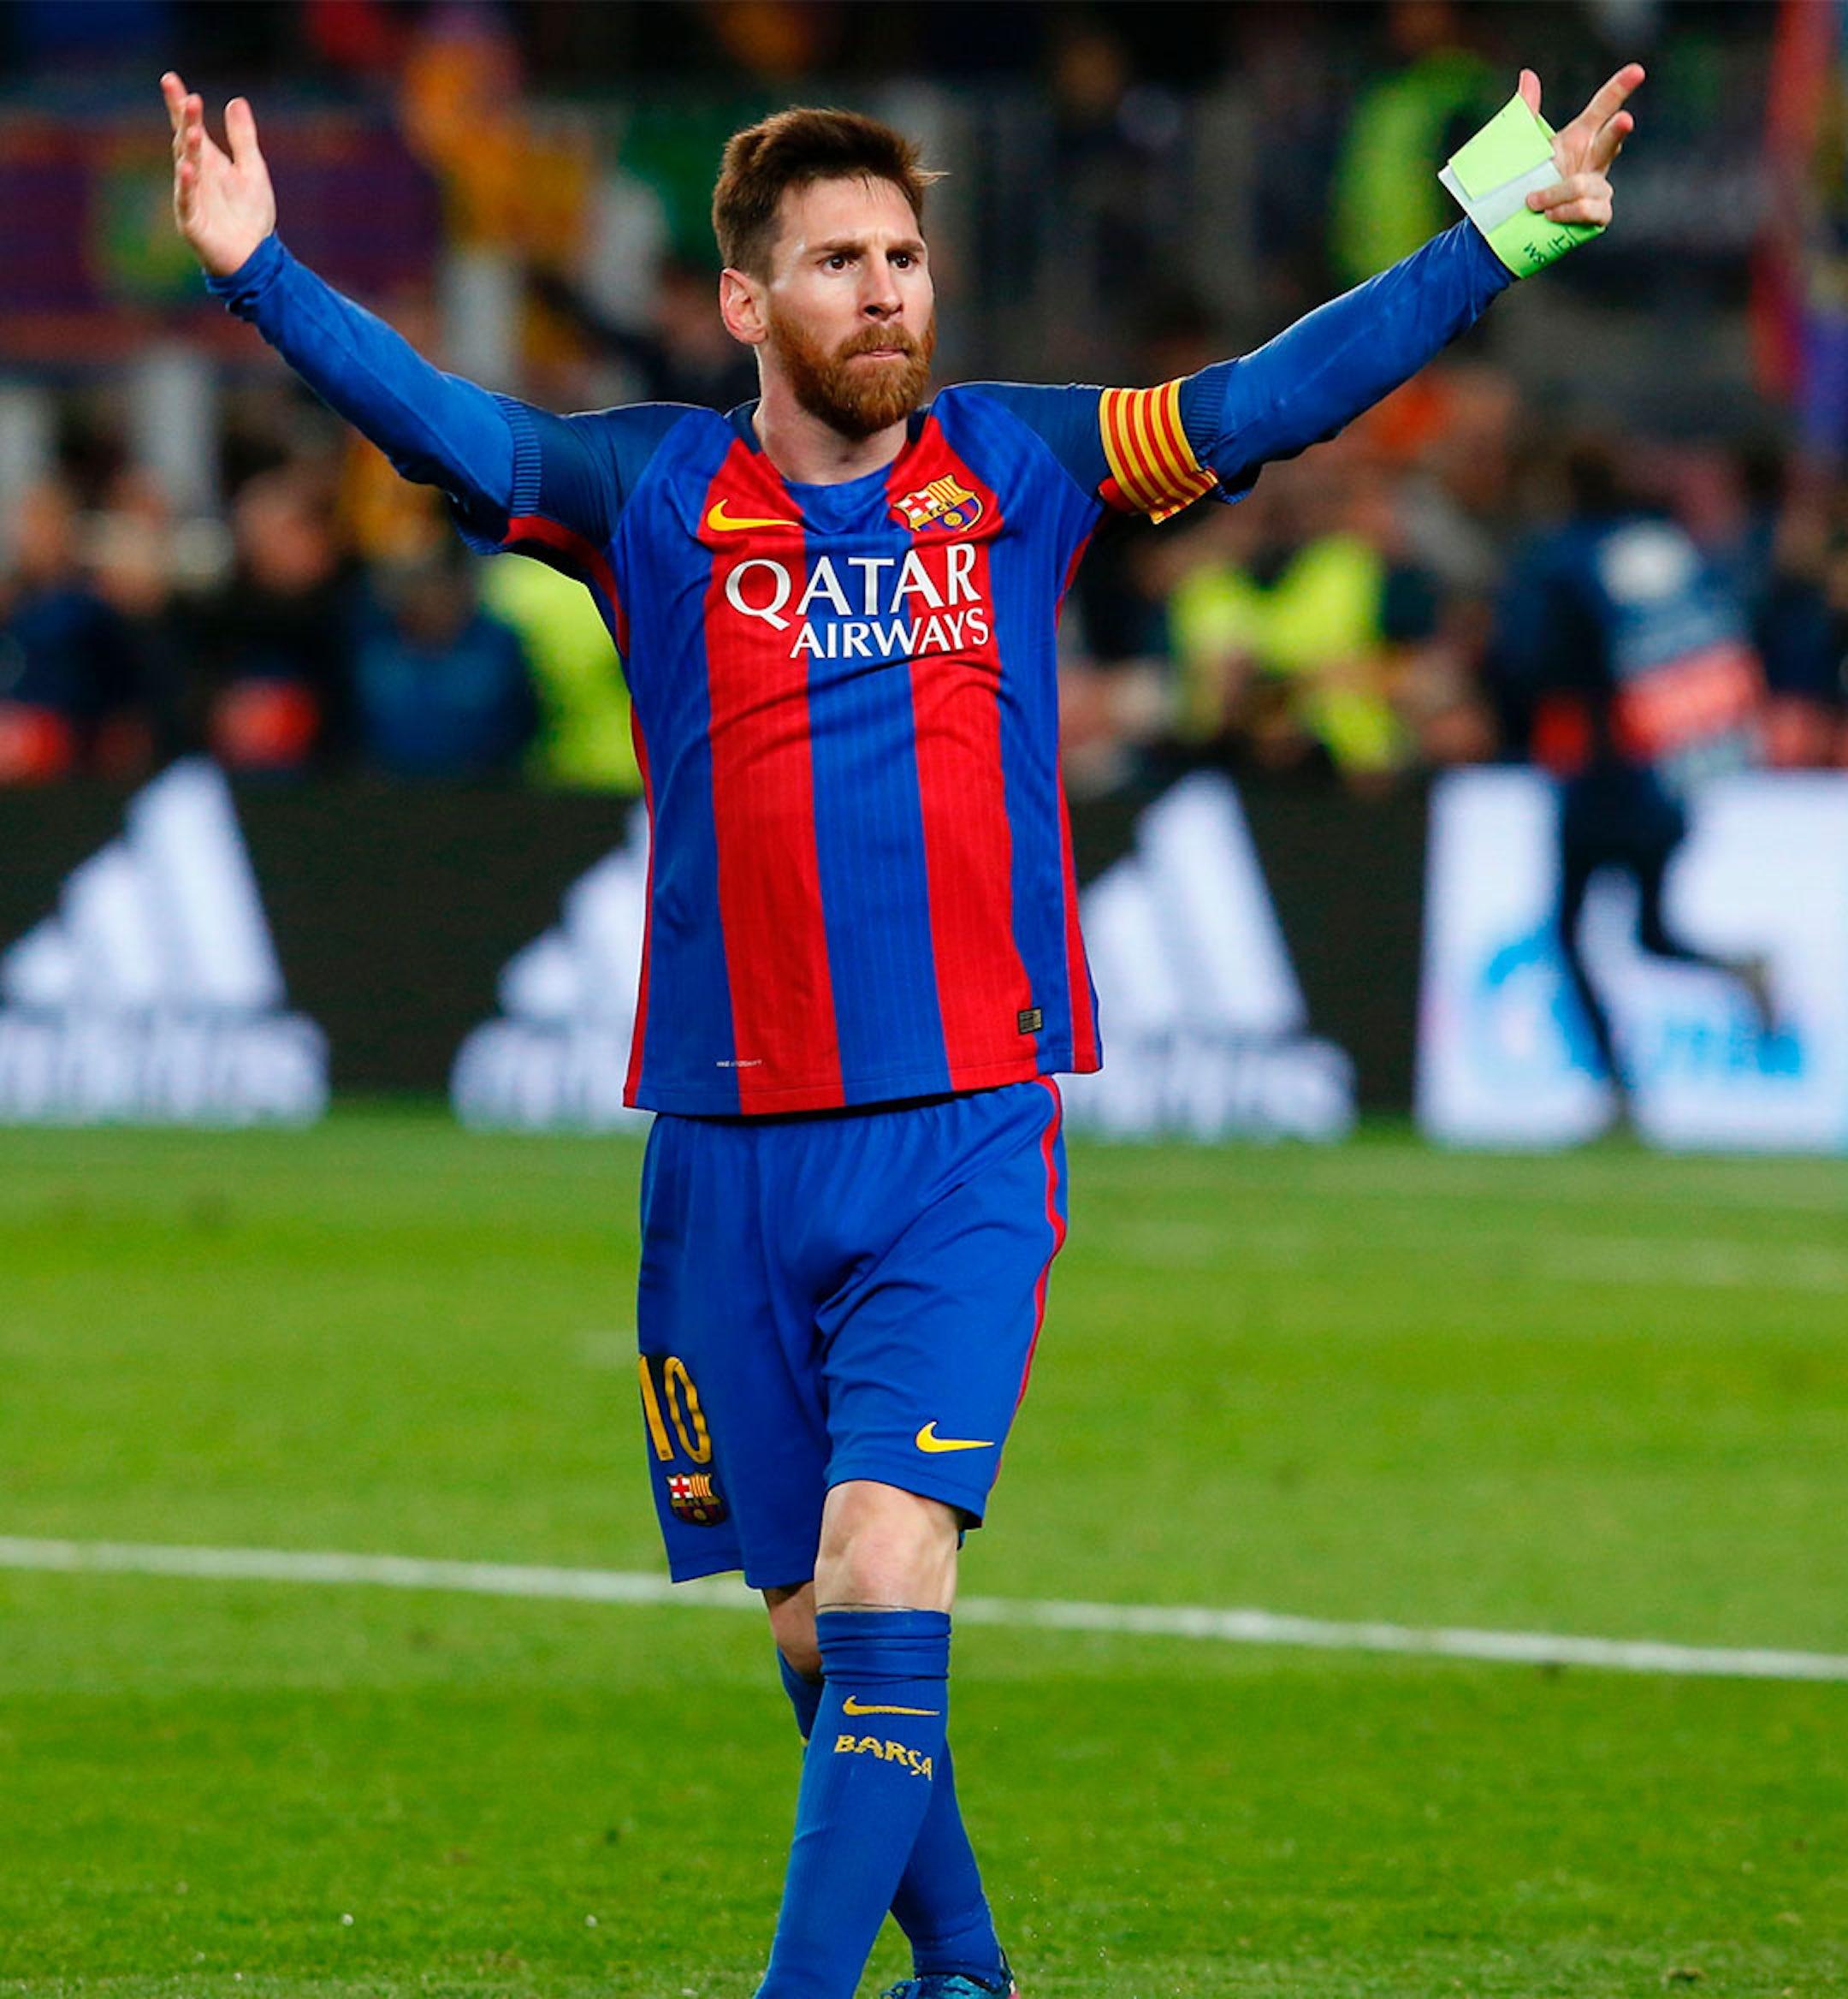 Messi Mobile Hero Imaeg 1080x1168